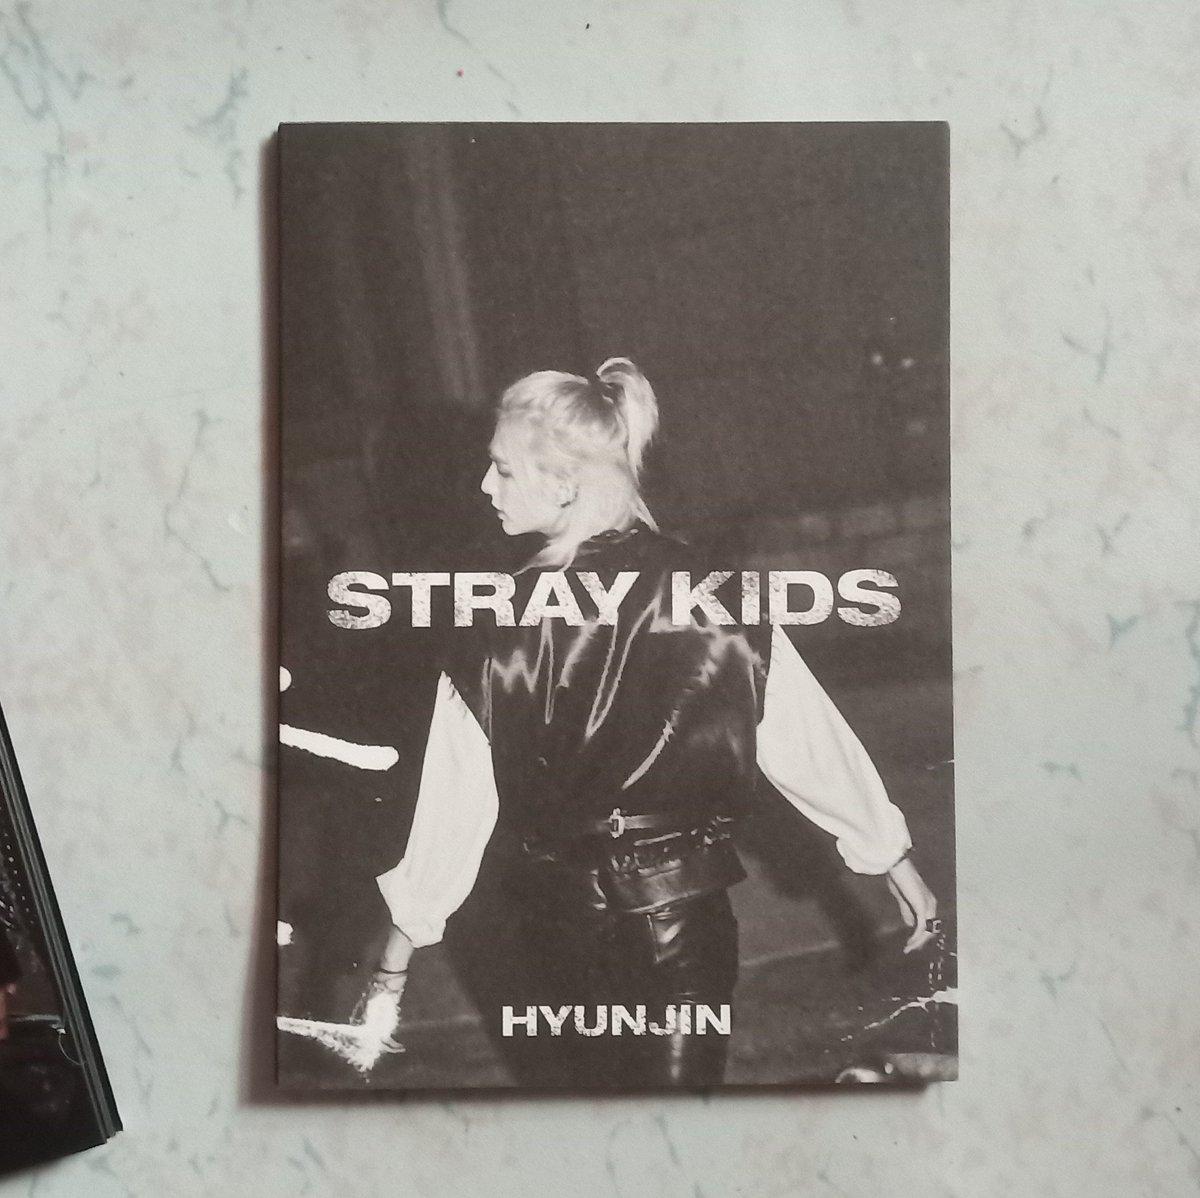 WTS/LFB #STRAYKIDS #SKZ #HYUNJIN  STRAY KIDS HYUNJIN IN LIFE MINI PHOTOBOOK POB - php 220  . Shopee